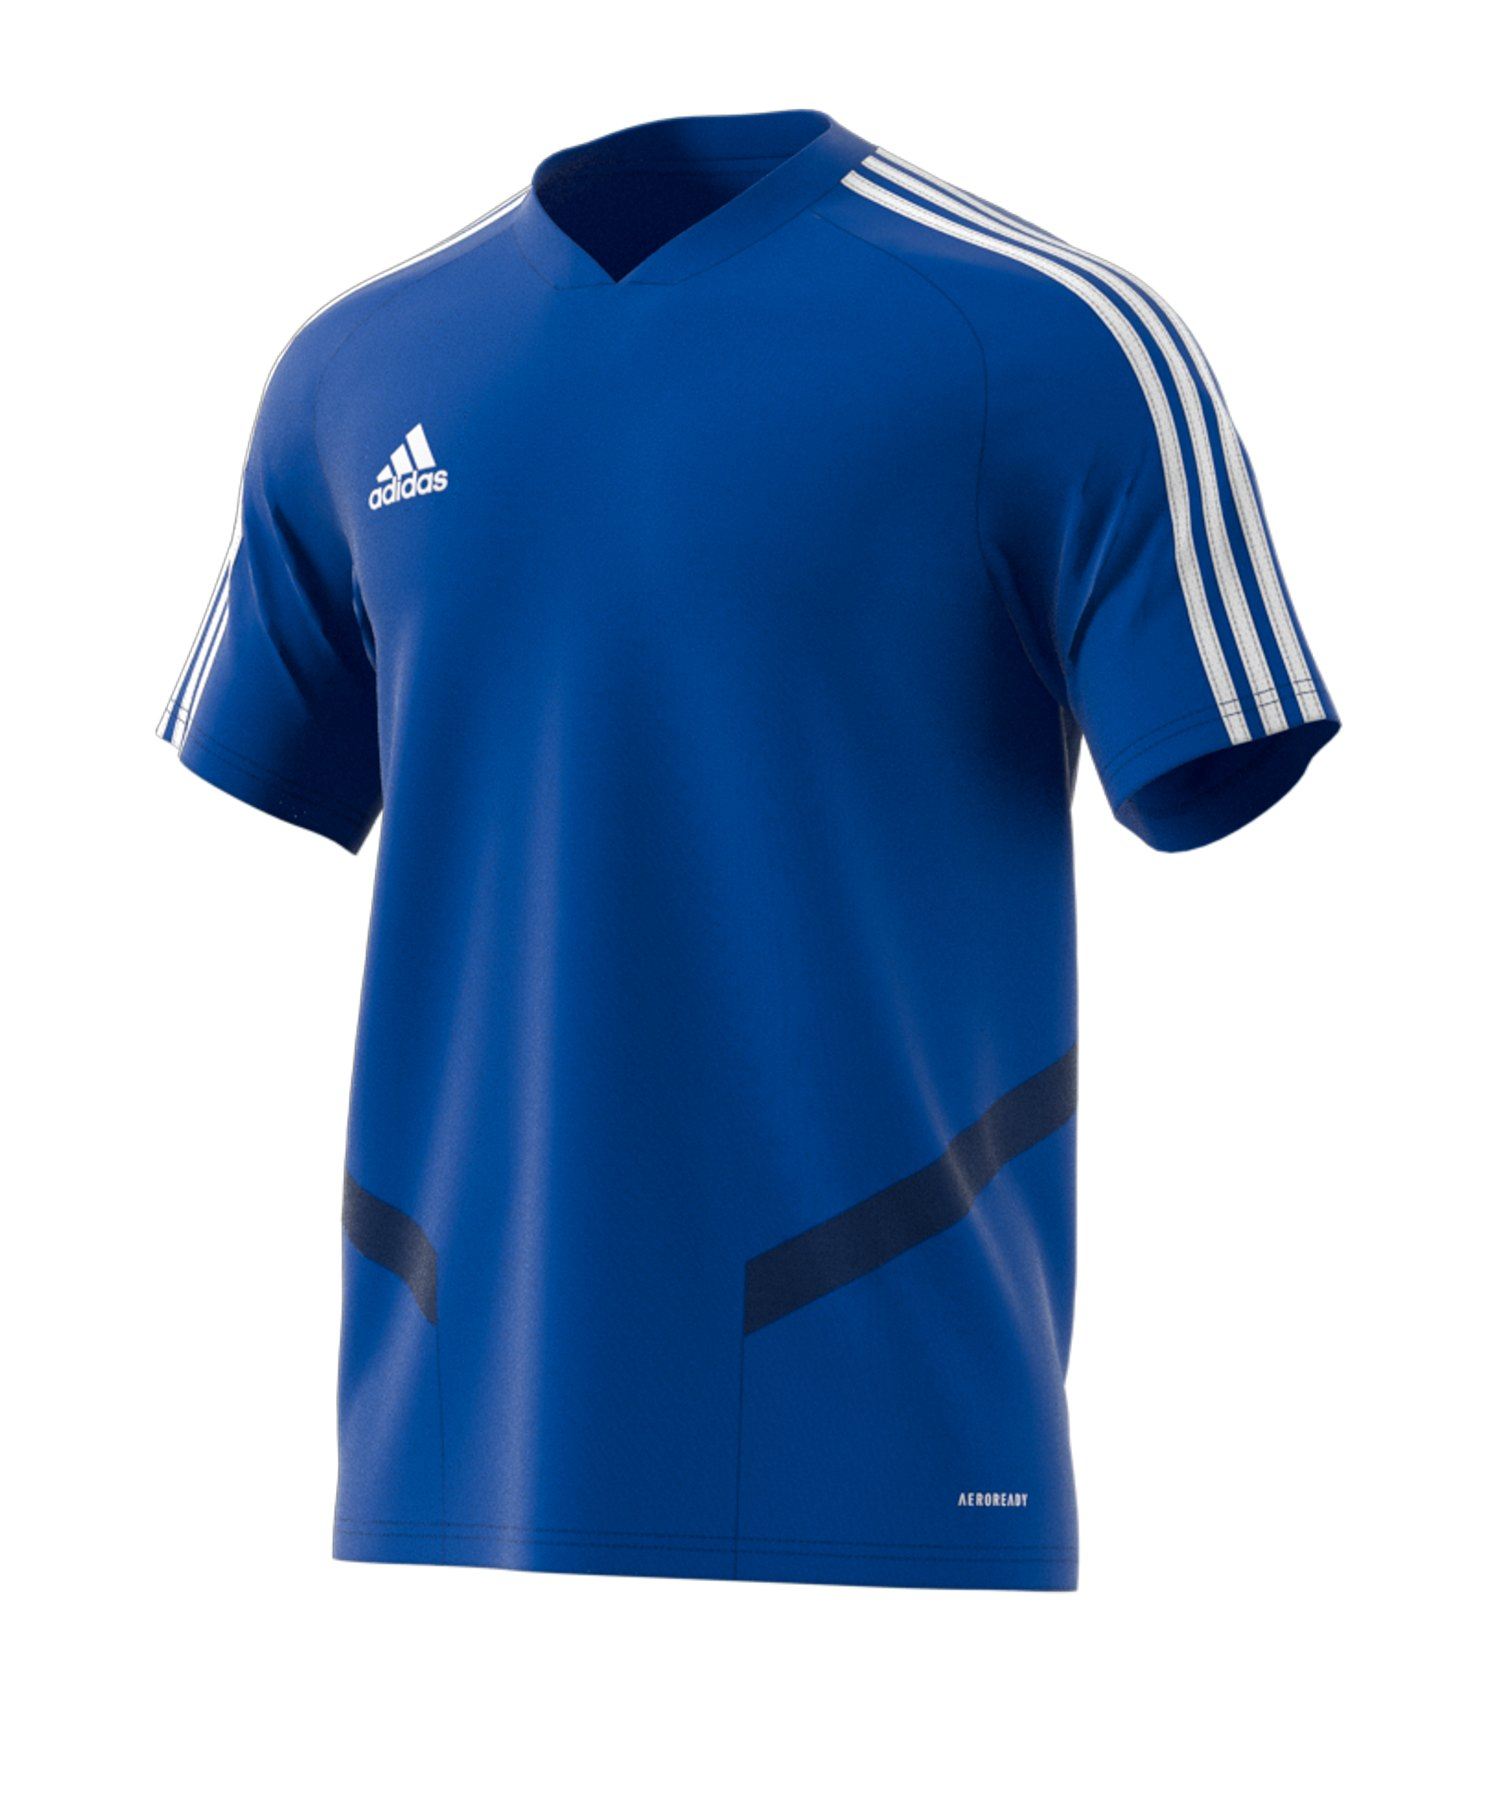 adidas Tiro 19 Trainingsshirt Kids Blau Weiss - blau